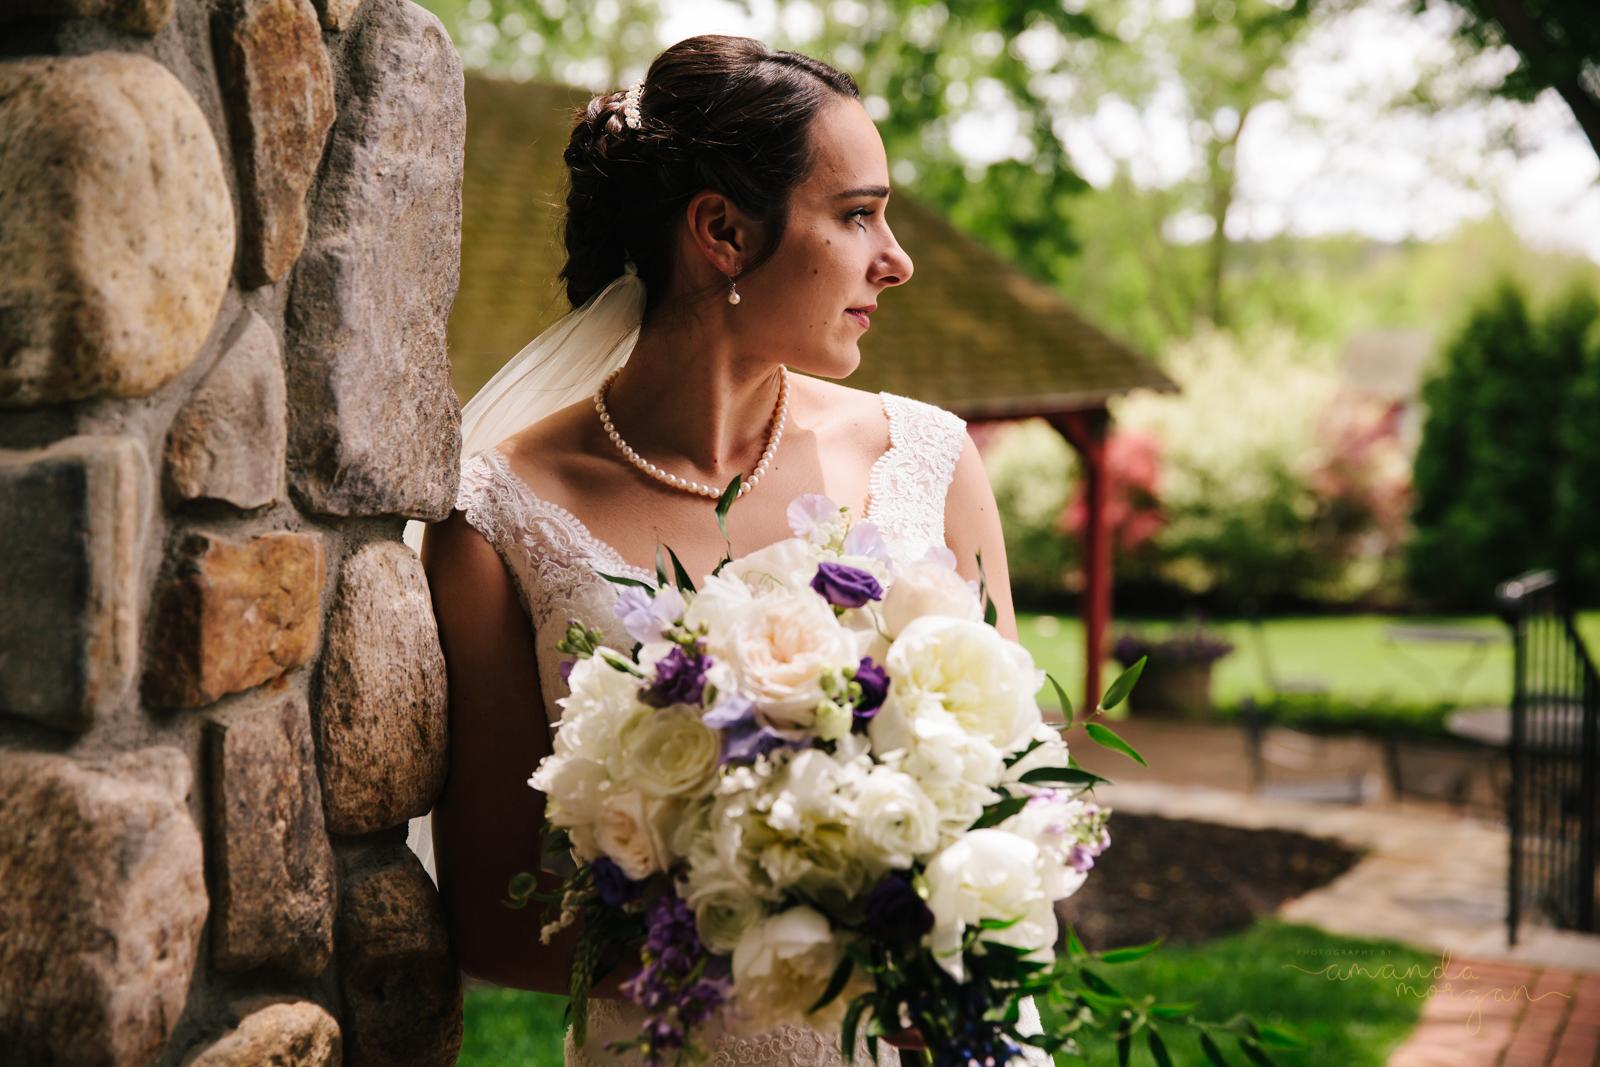 Publick-House-Wedding-Amanda-Morgan-17.jpg